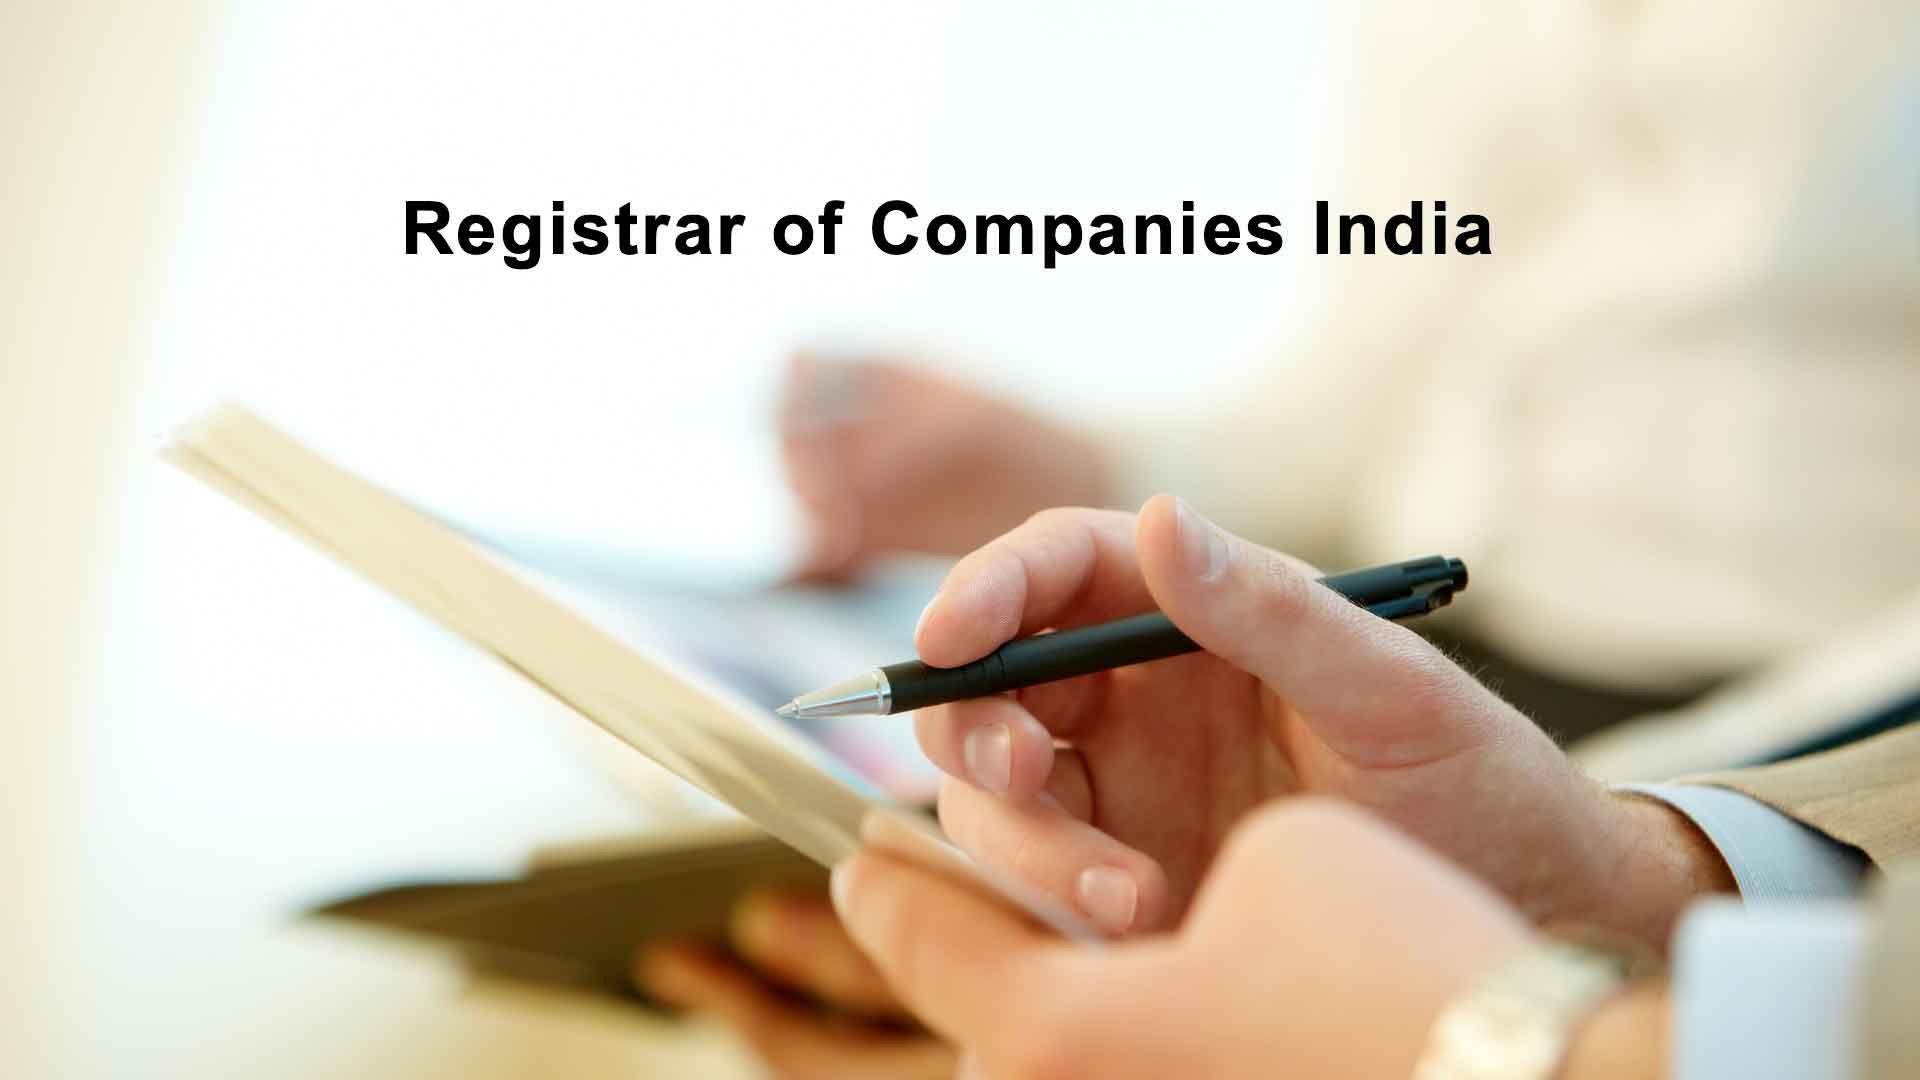 Registrar of Companies Bangalore, Karnataka